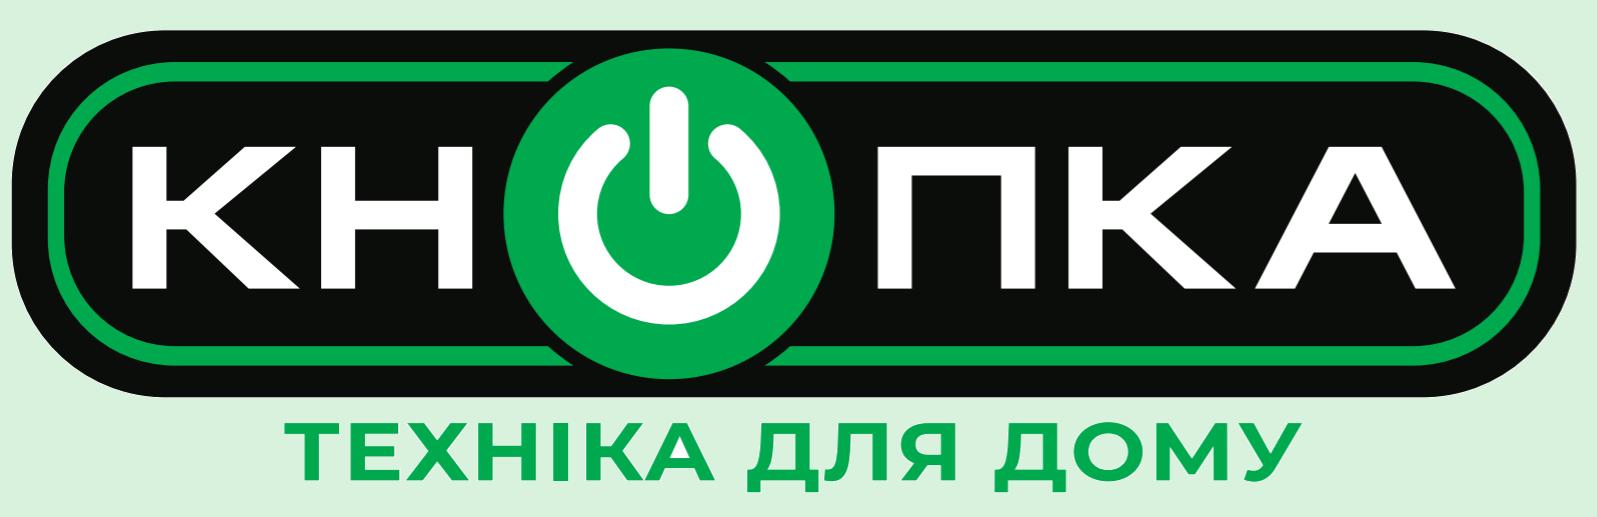 Магазин Кнопка